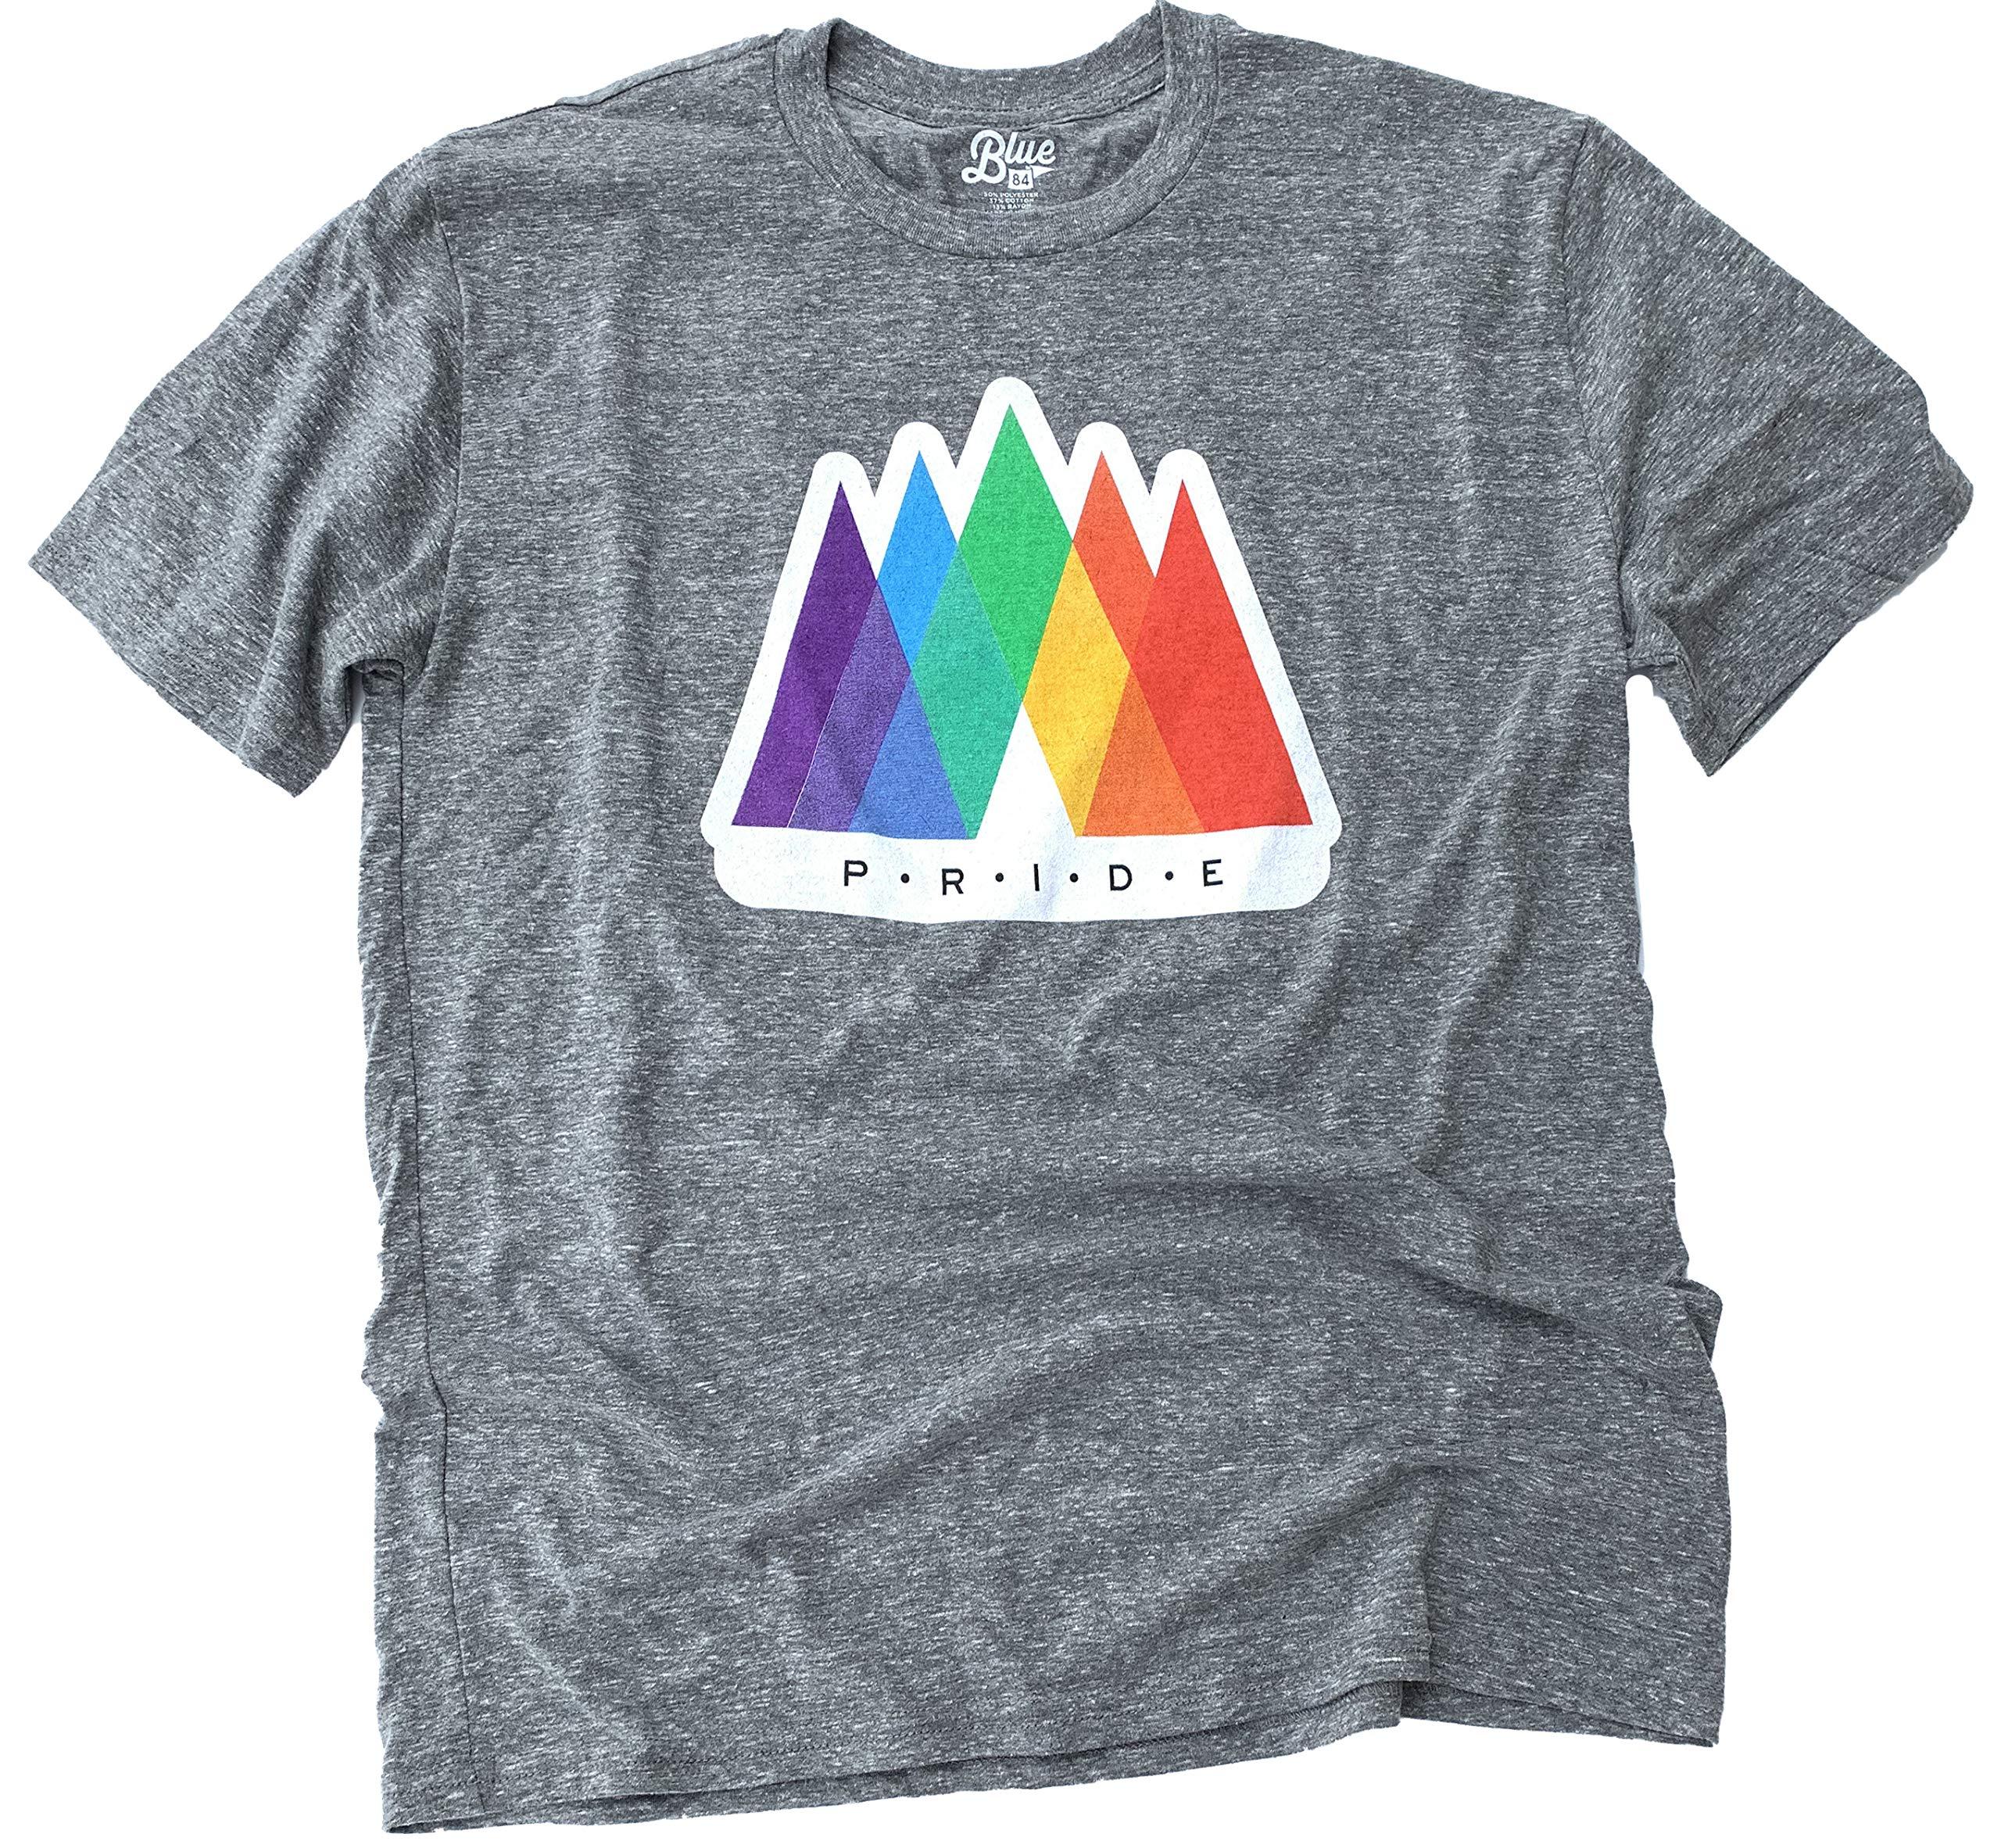 Pride Lgbtq Tshirt In Mountain Rainbow Design